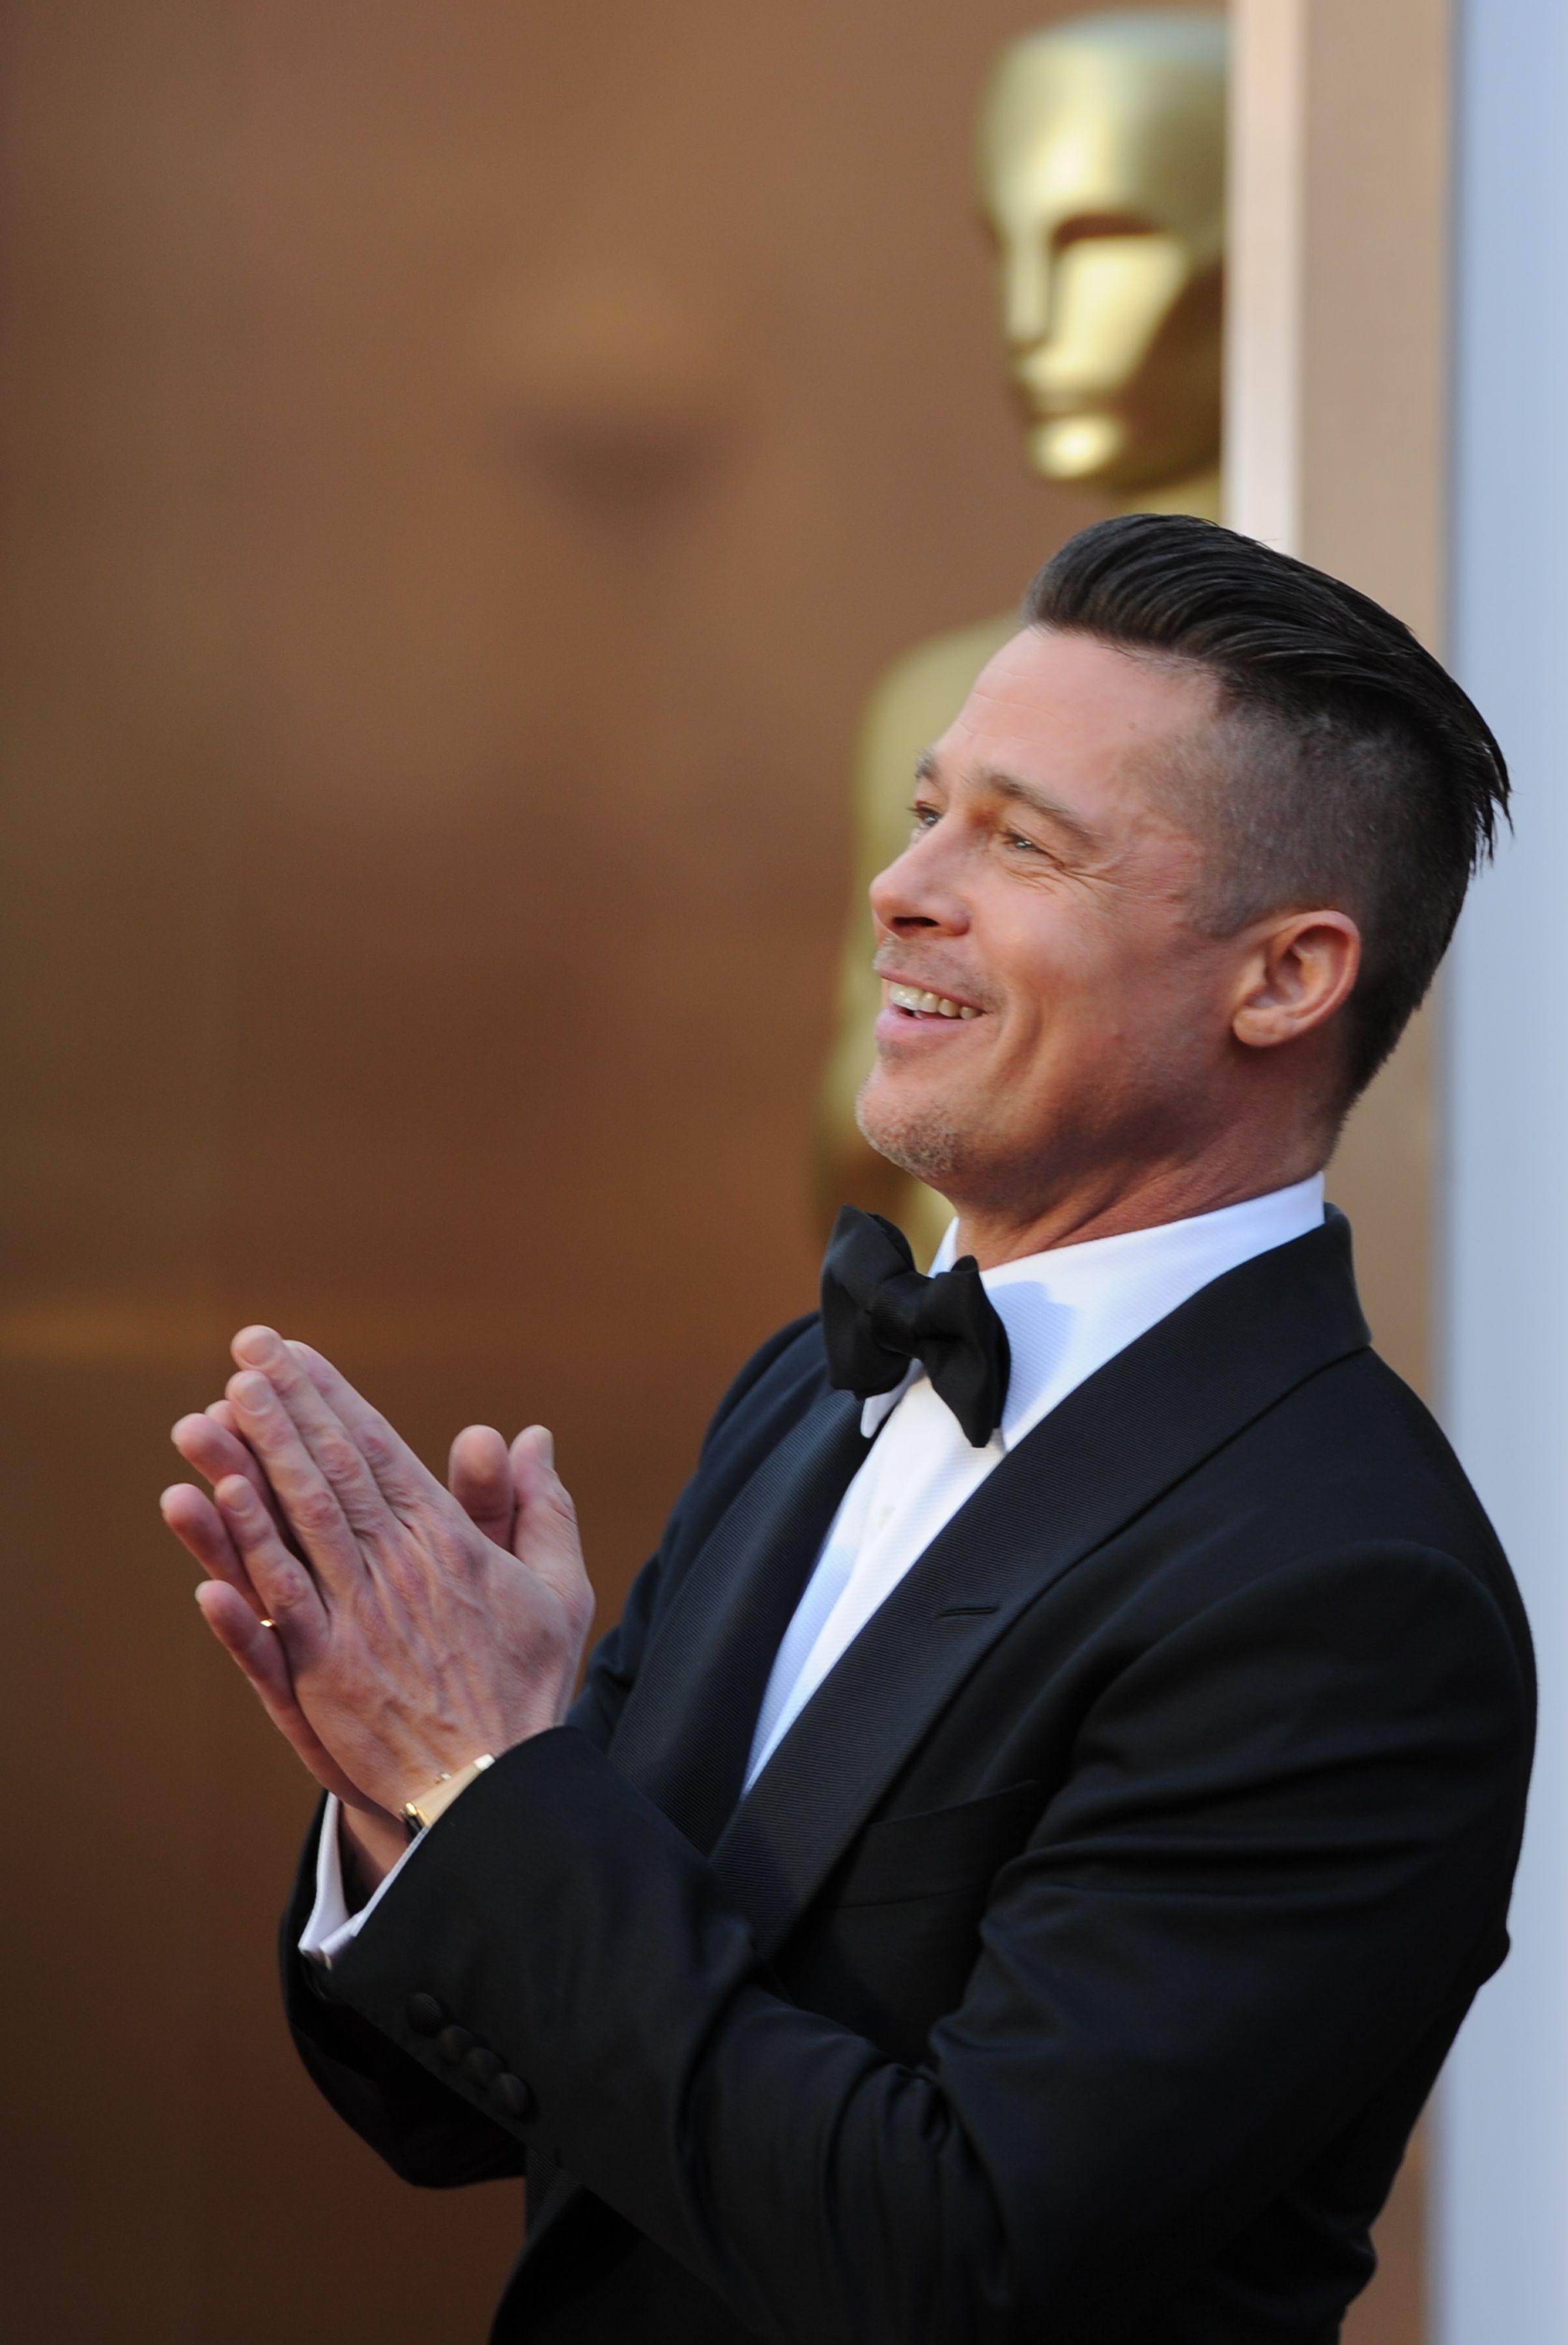 The Best Brad Pitt Haircuts Hairstyles Ultimate Guide In 2020 Brad Pitt Haircut Brad Pitt Hair Brad Pitt